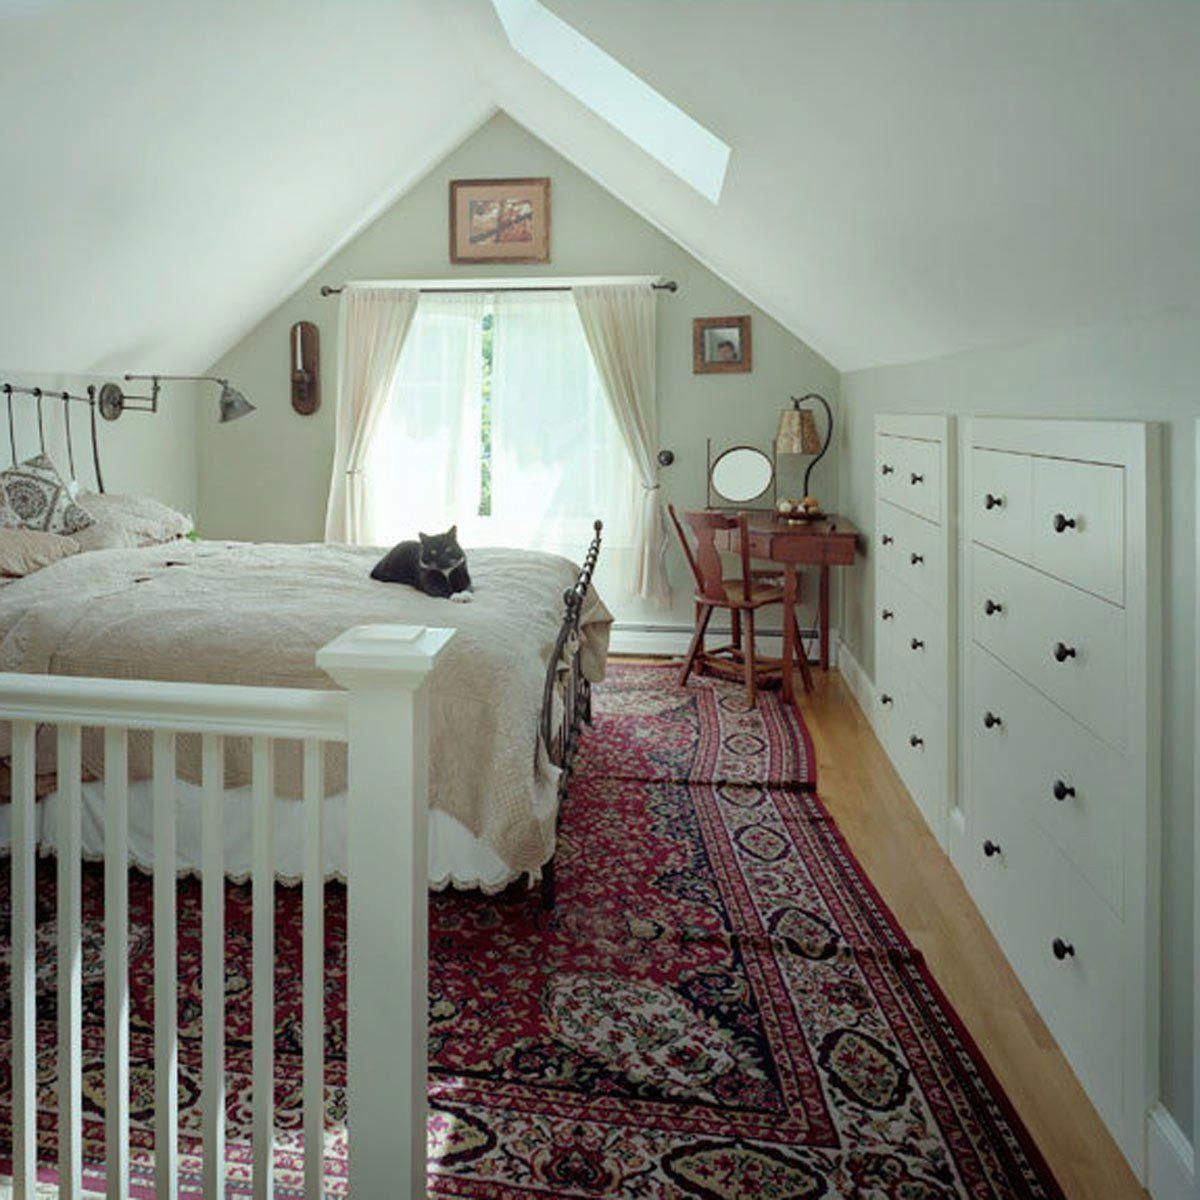 13 Unexpected Attic Spaces You Ll Adore In 2020 Attic Bedroom Small Attic Master Bedroom Attic Bedroom Designs